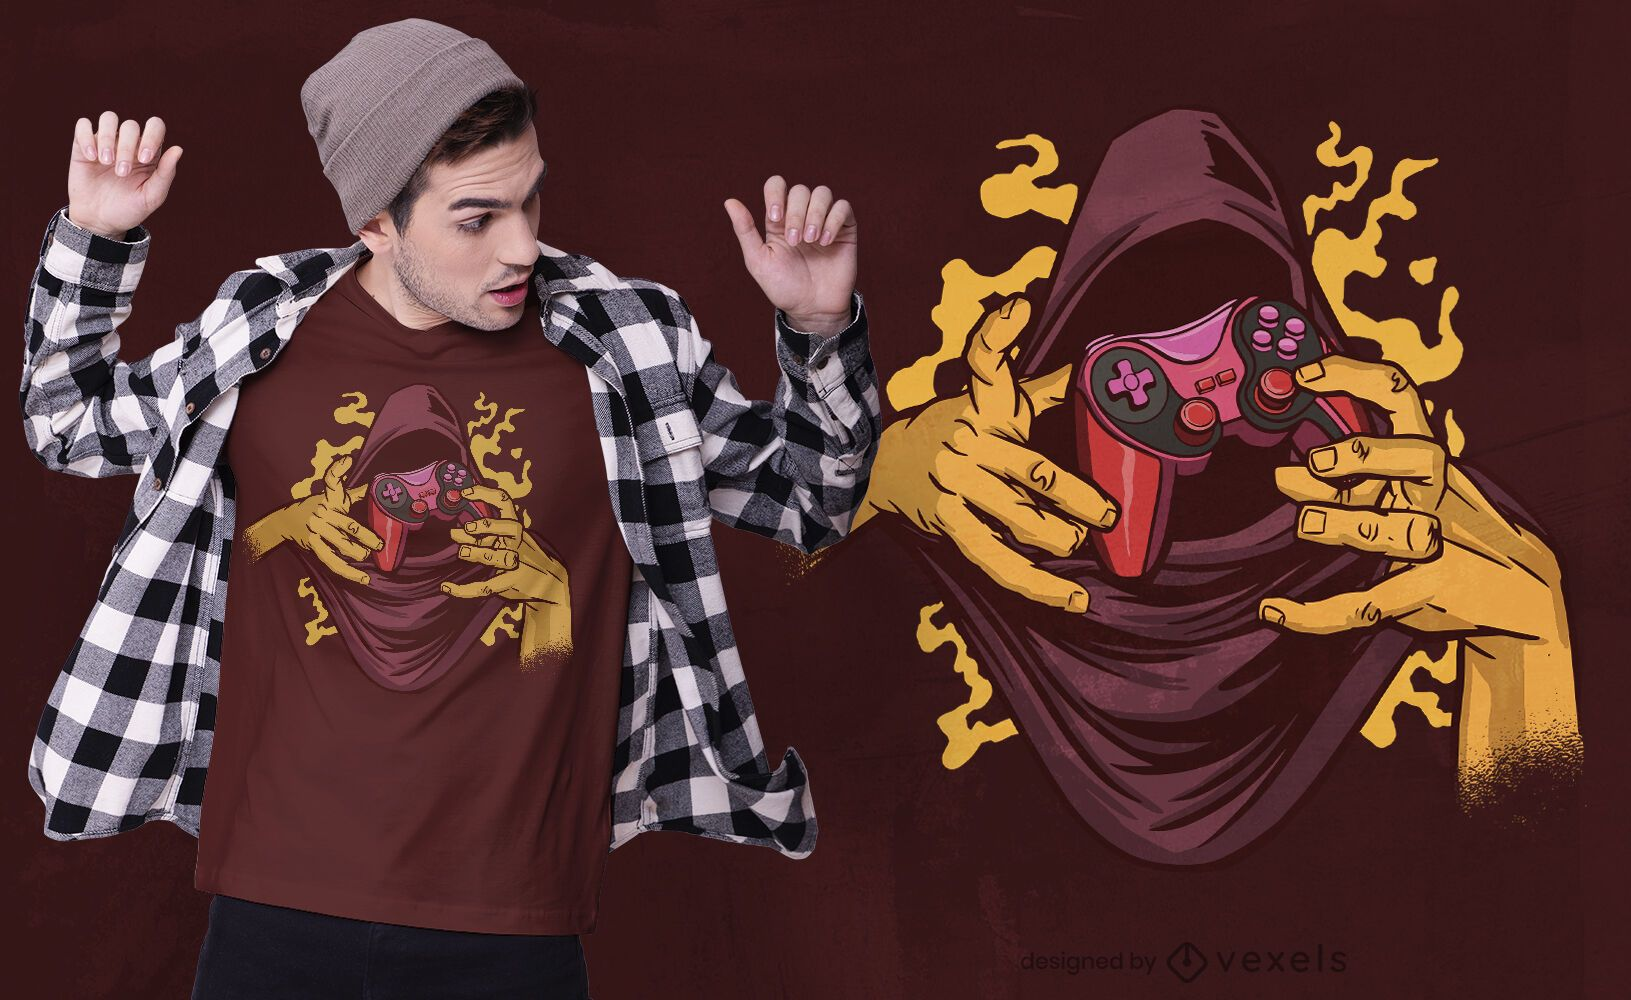 Magic joystick t-shirt design